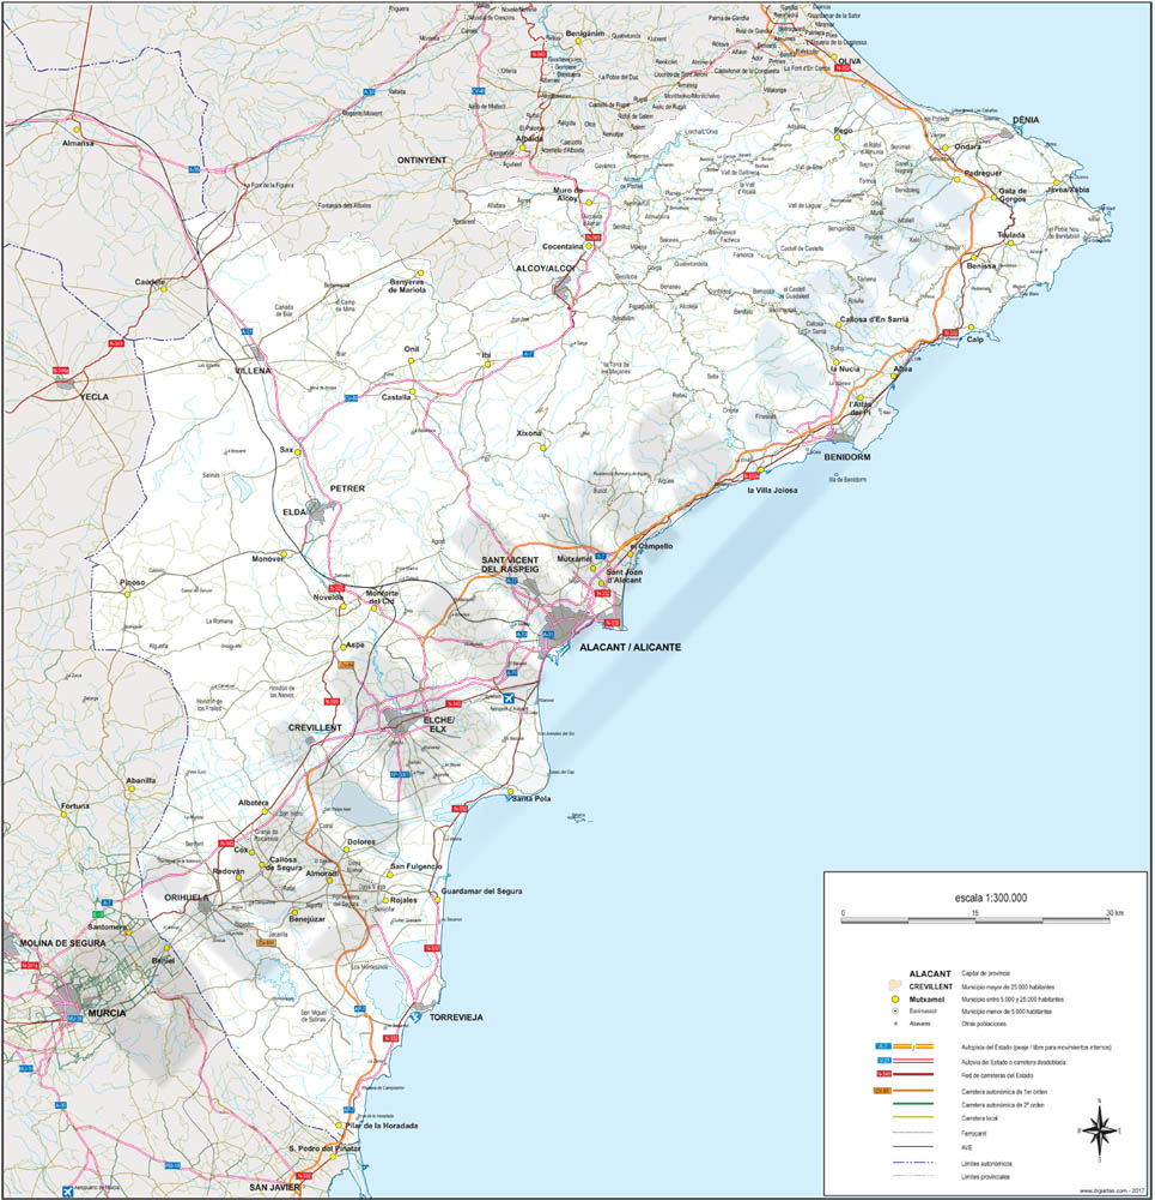 Alicante - Map of province